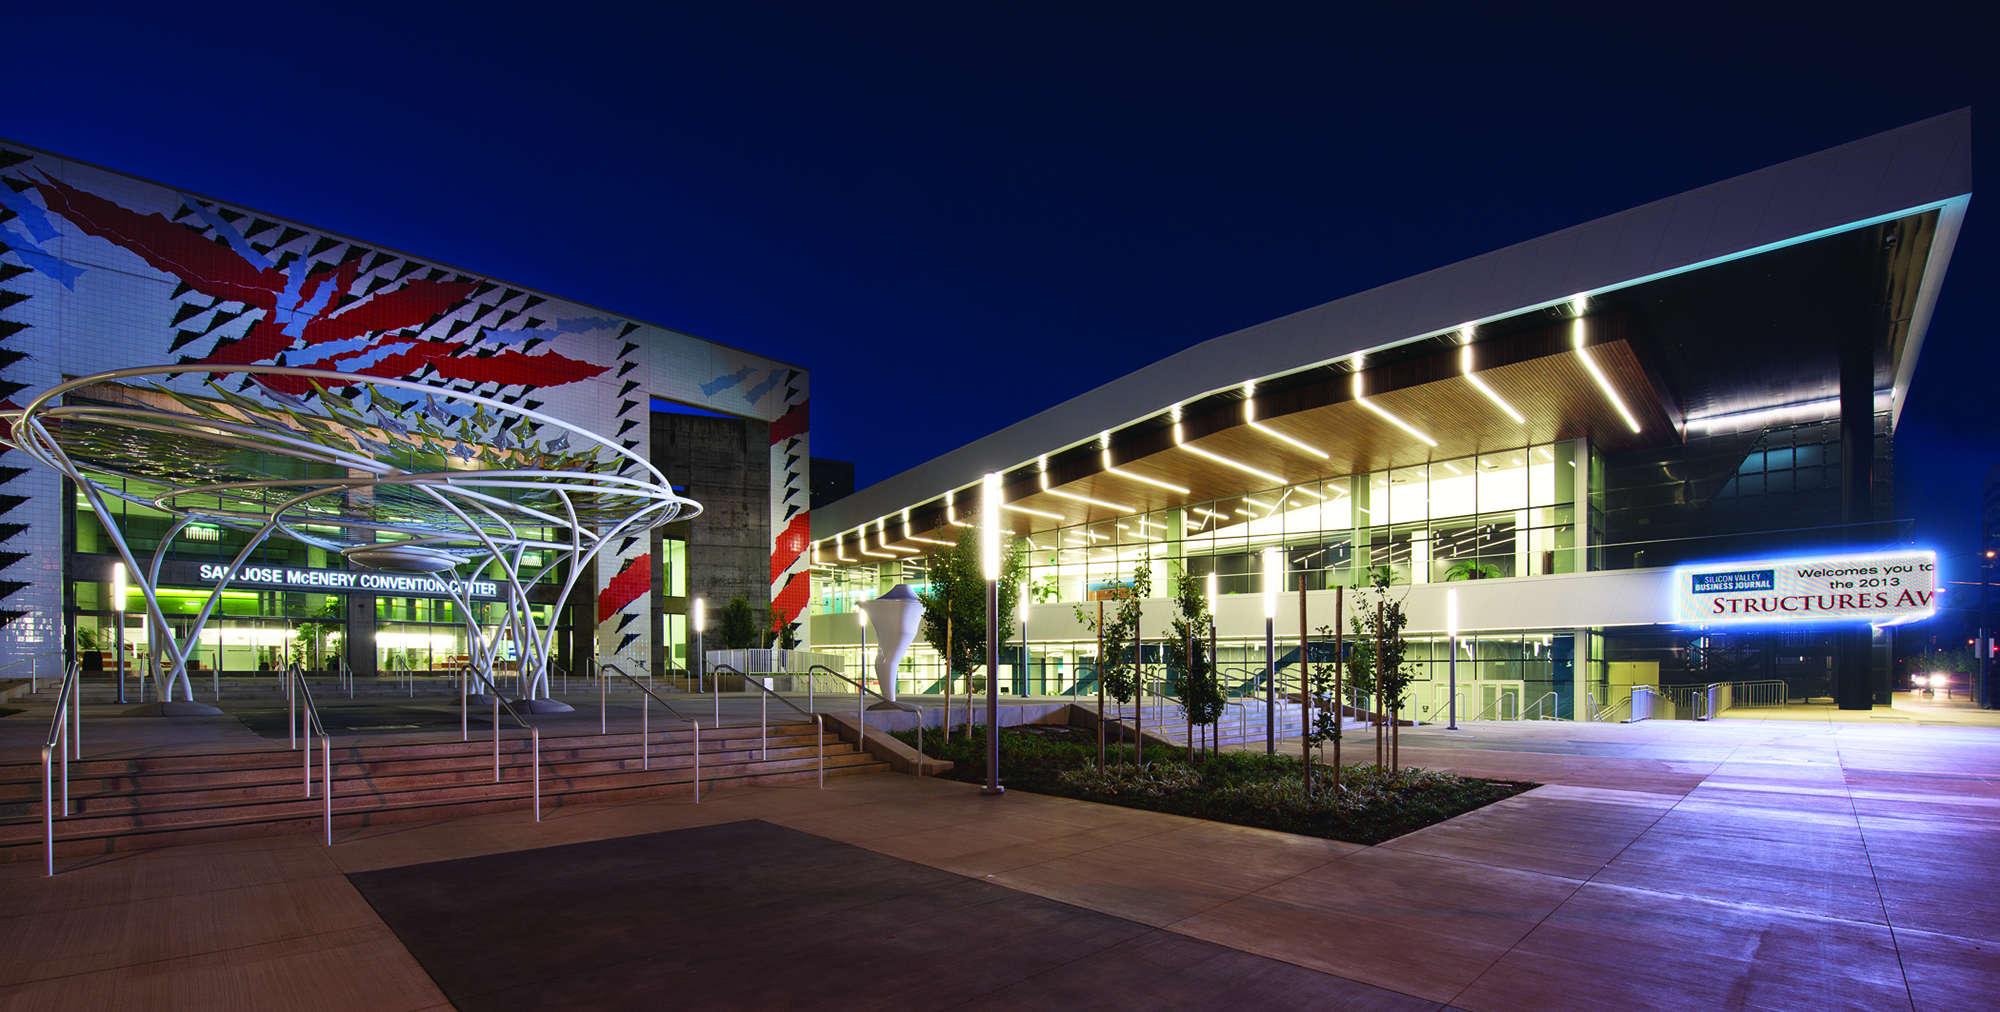 McEnery Convention Center San Jose